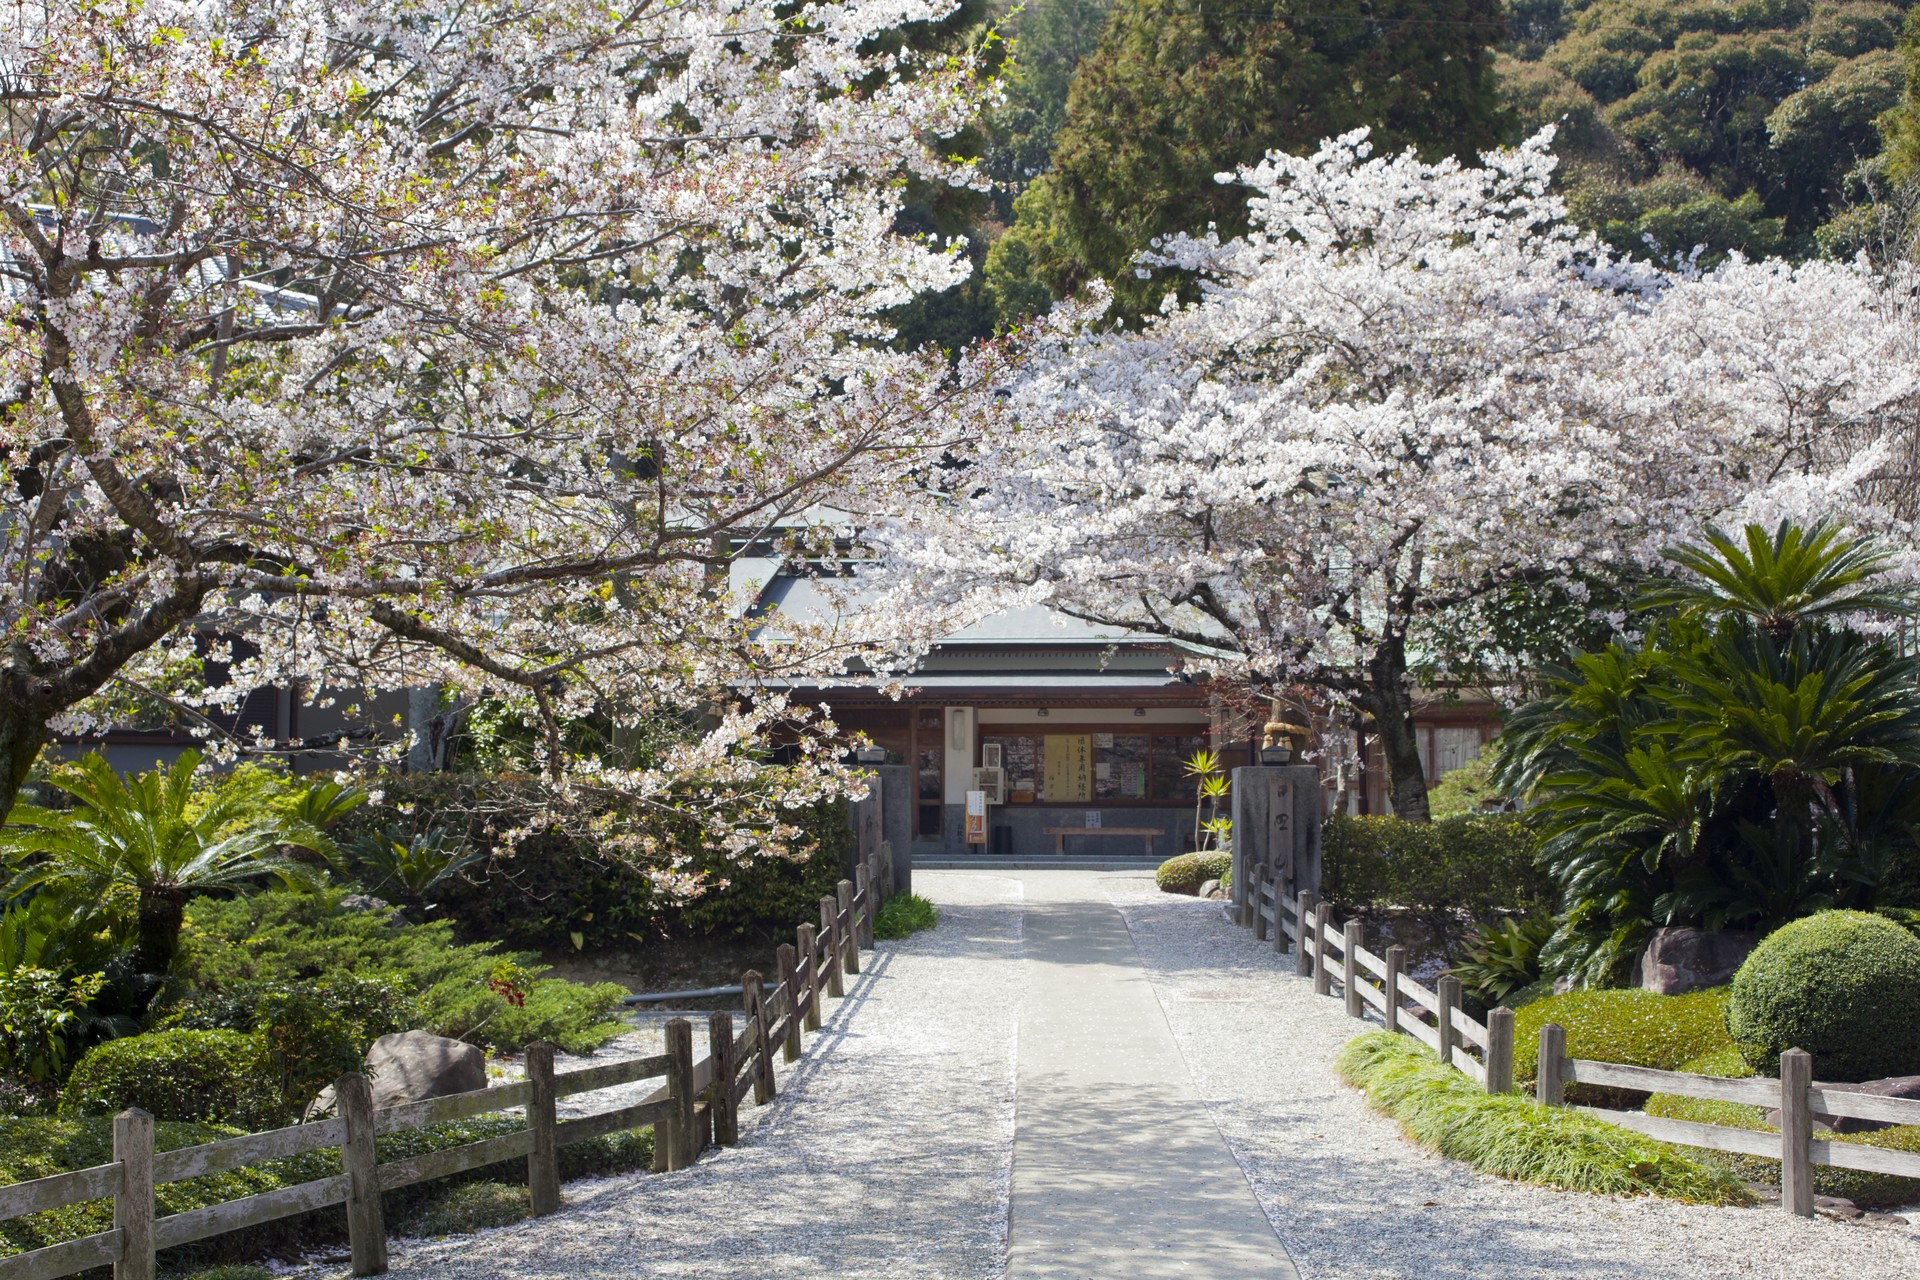 Temple on Shikoku pilgrimage route